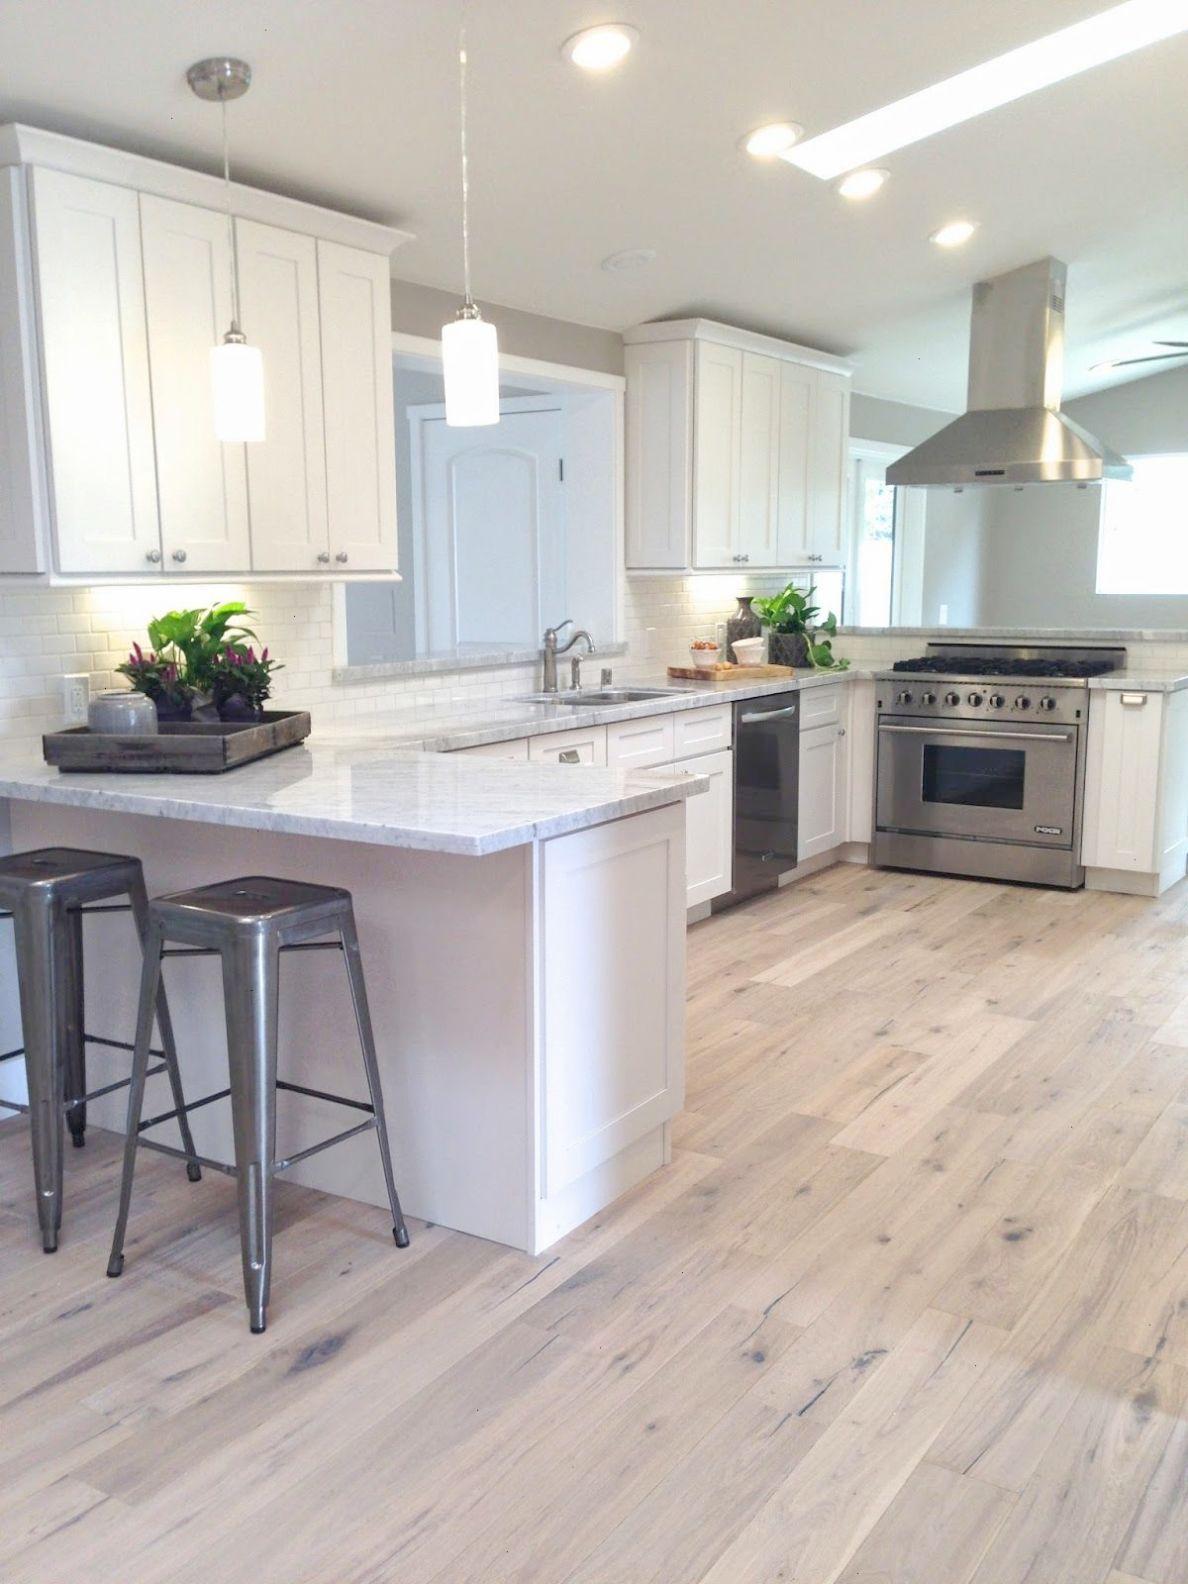 Best of 2014: Rossmoor house finished Greige Design   Kitchen ideas ...